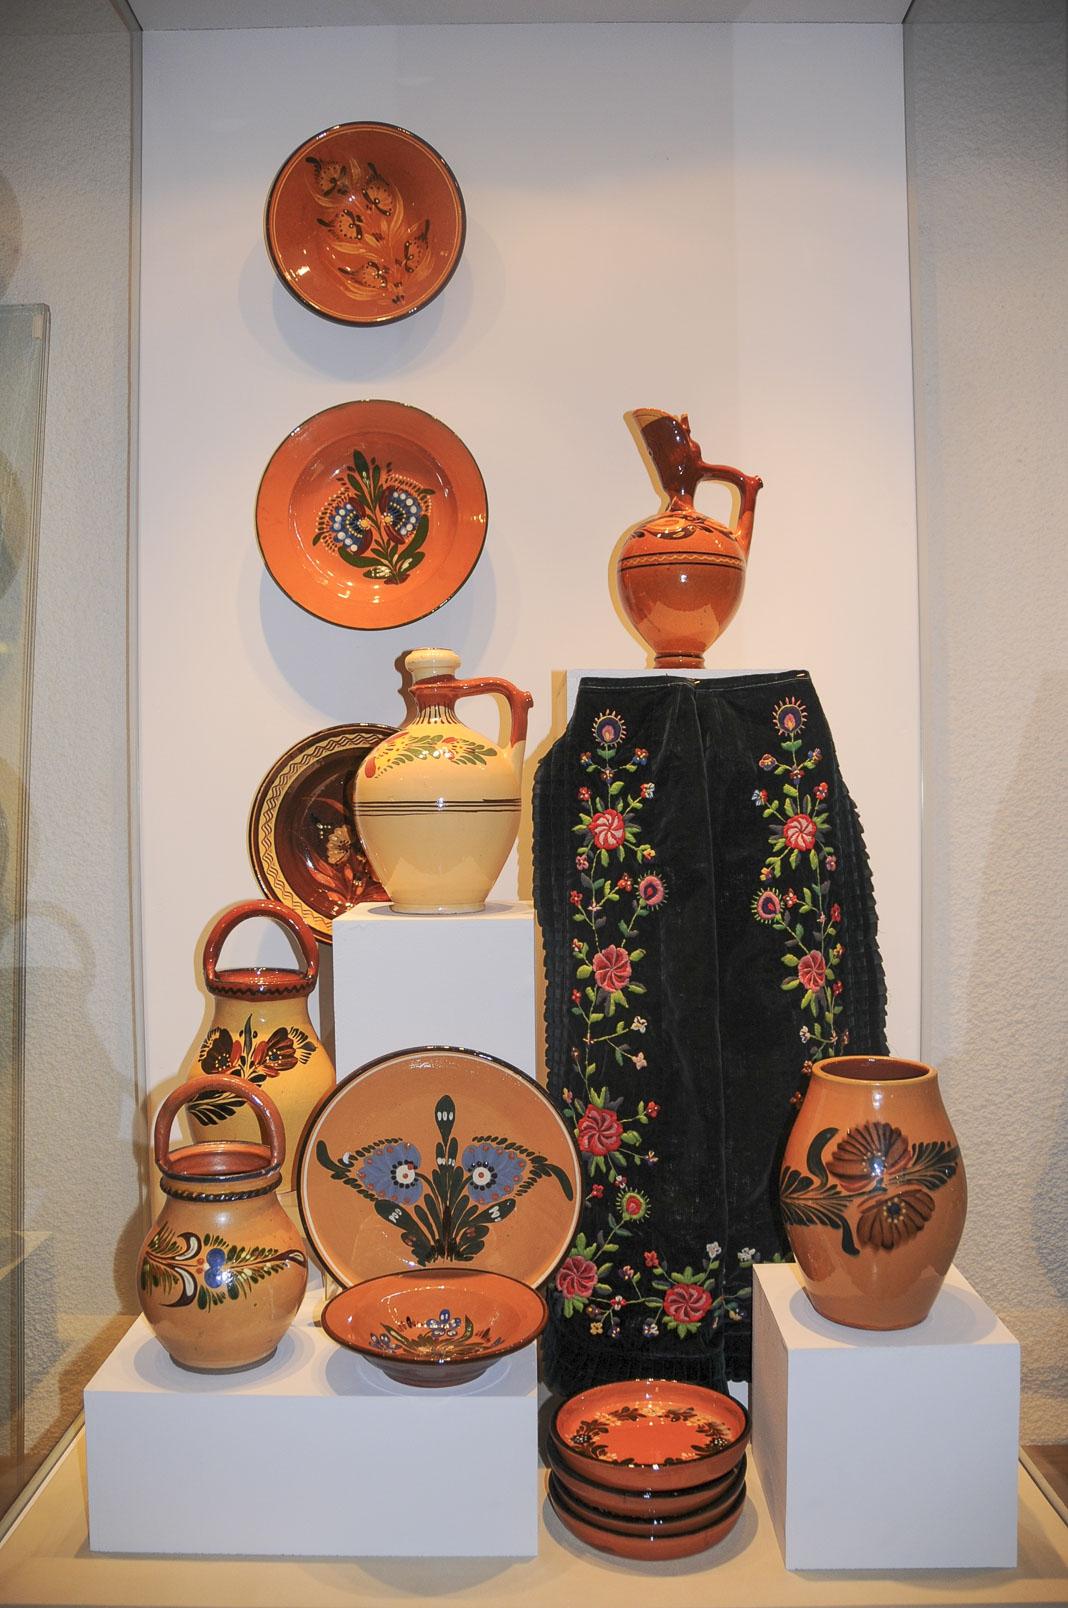 troyan-museum-cvetqta-na-zografa-4